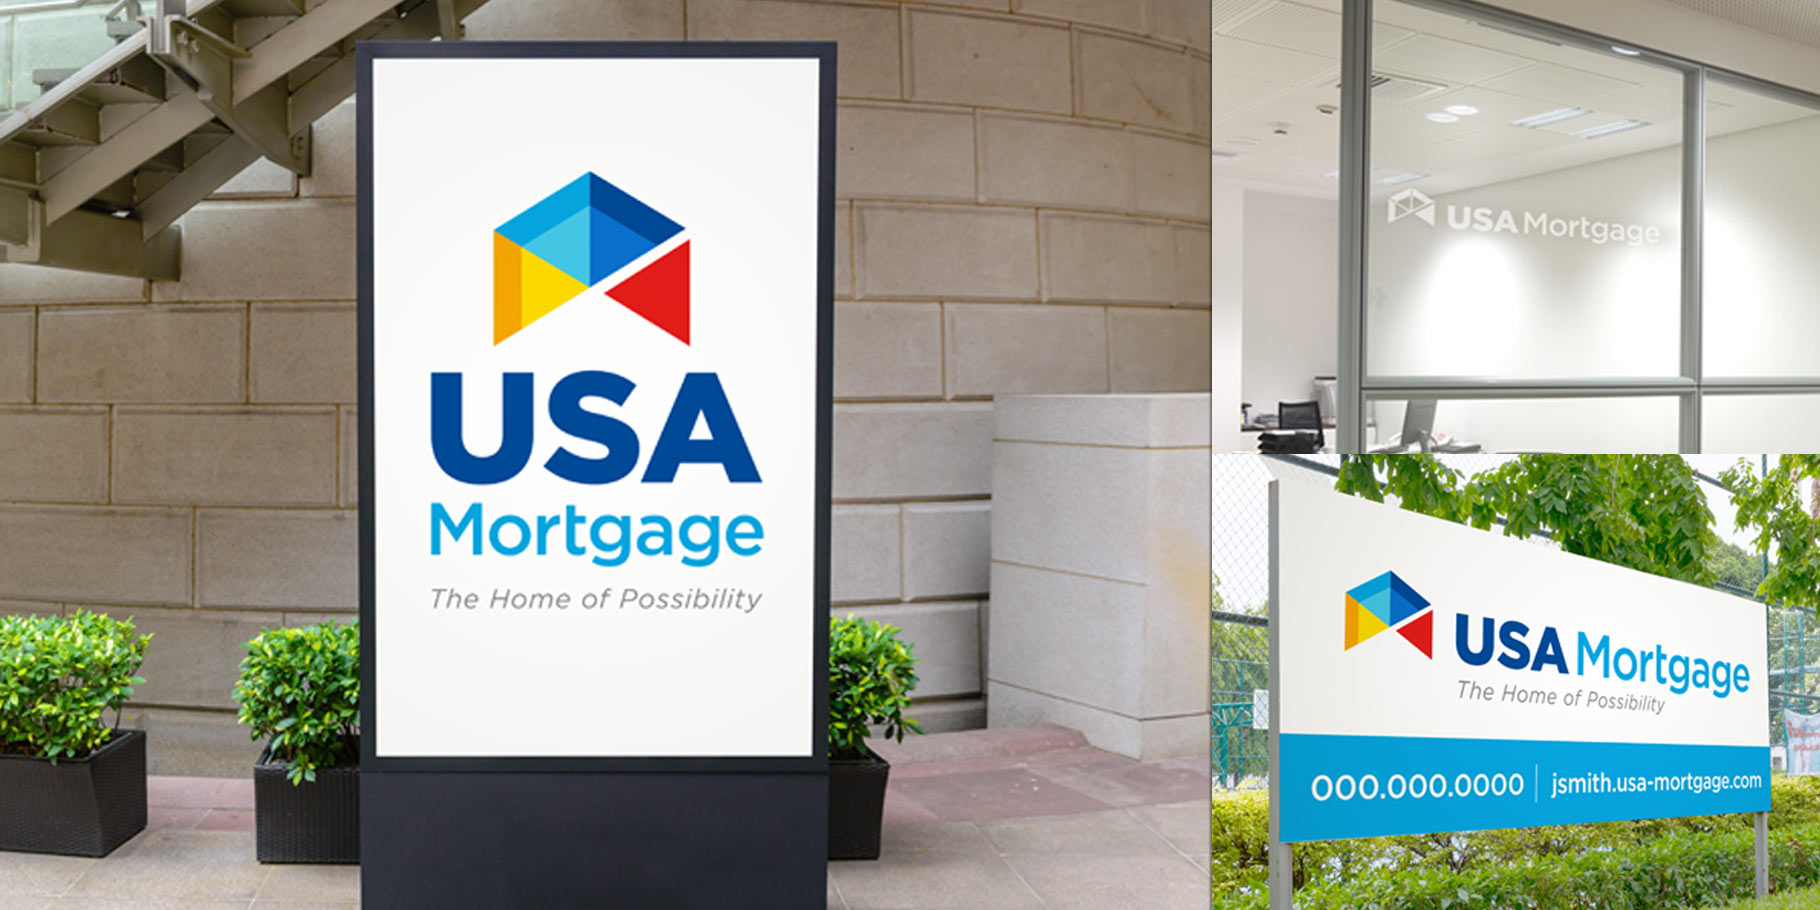 various applications of USA Mortgage logos